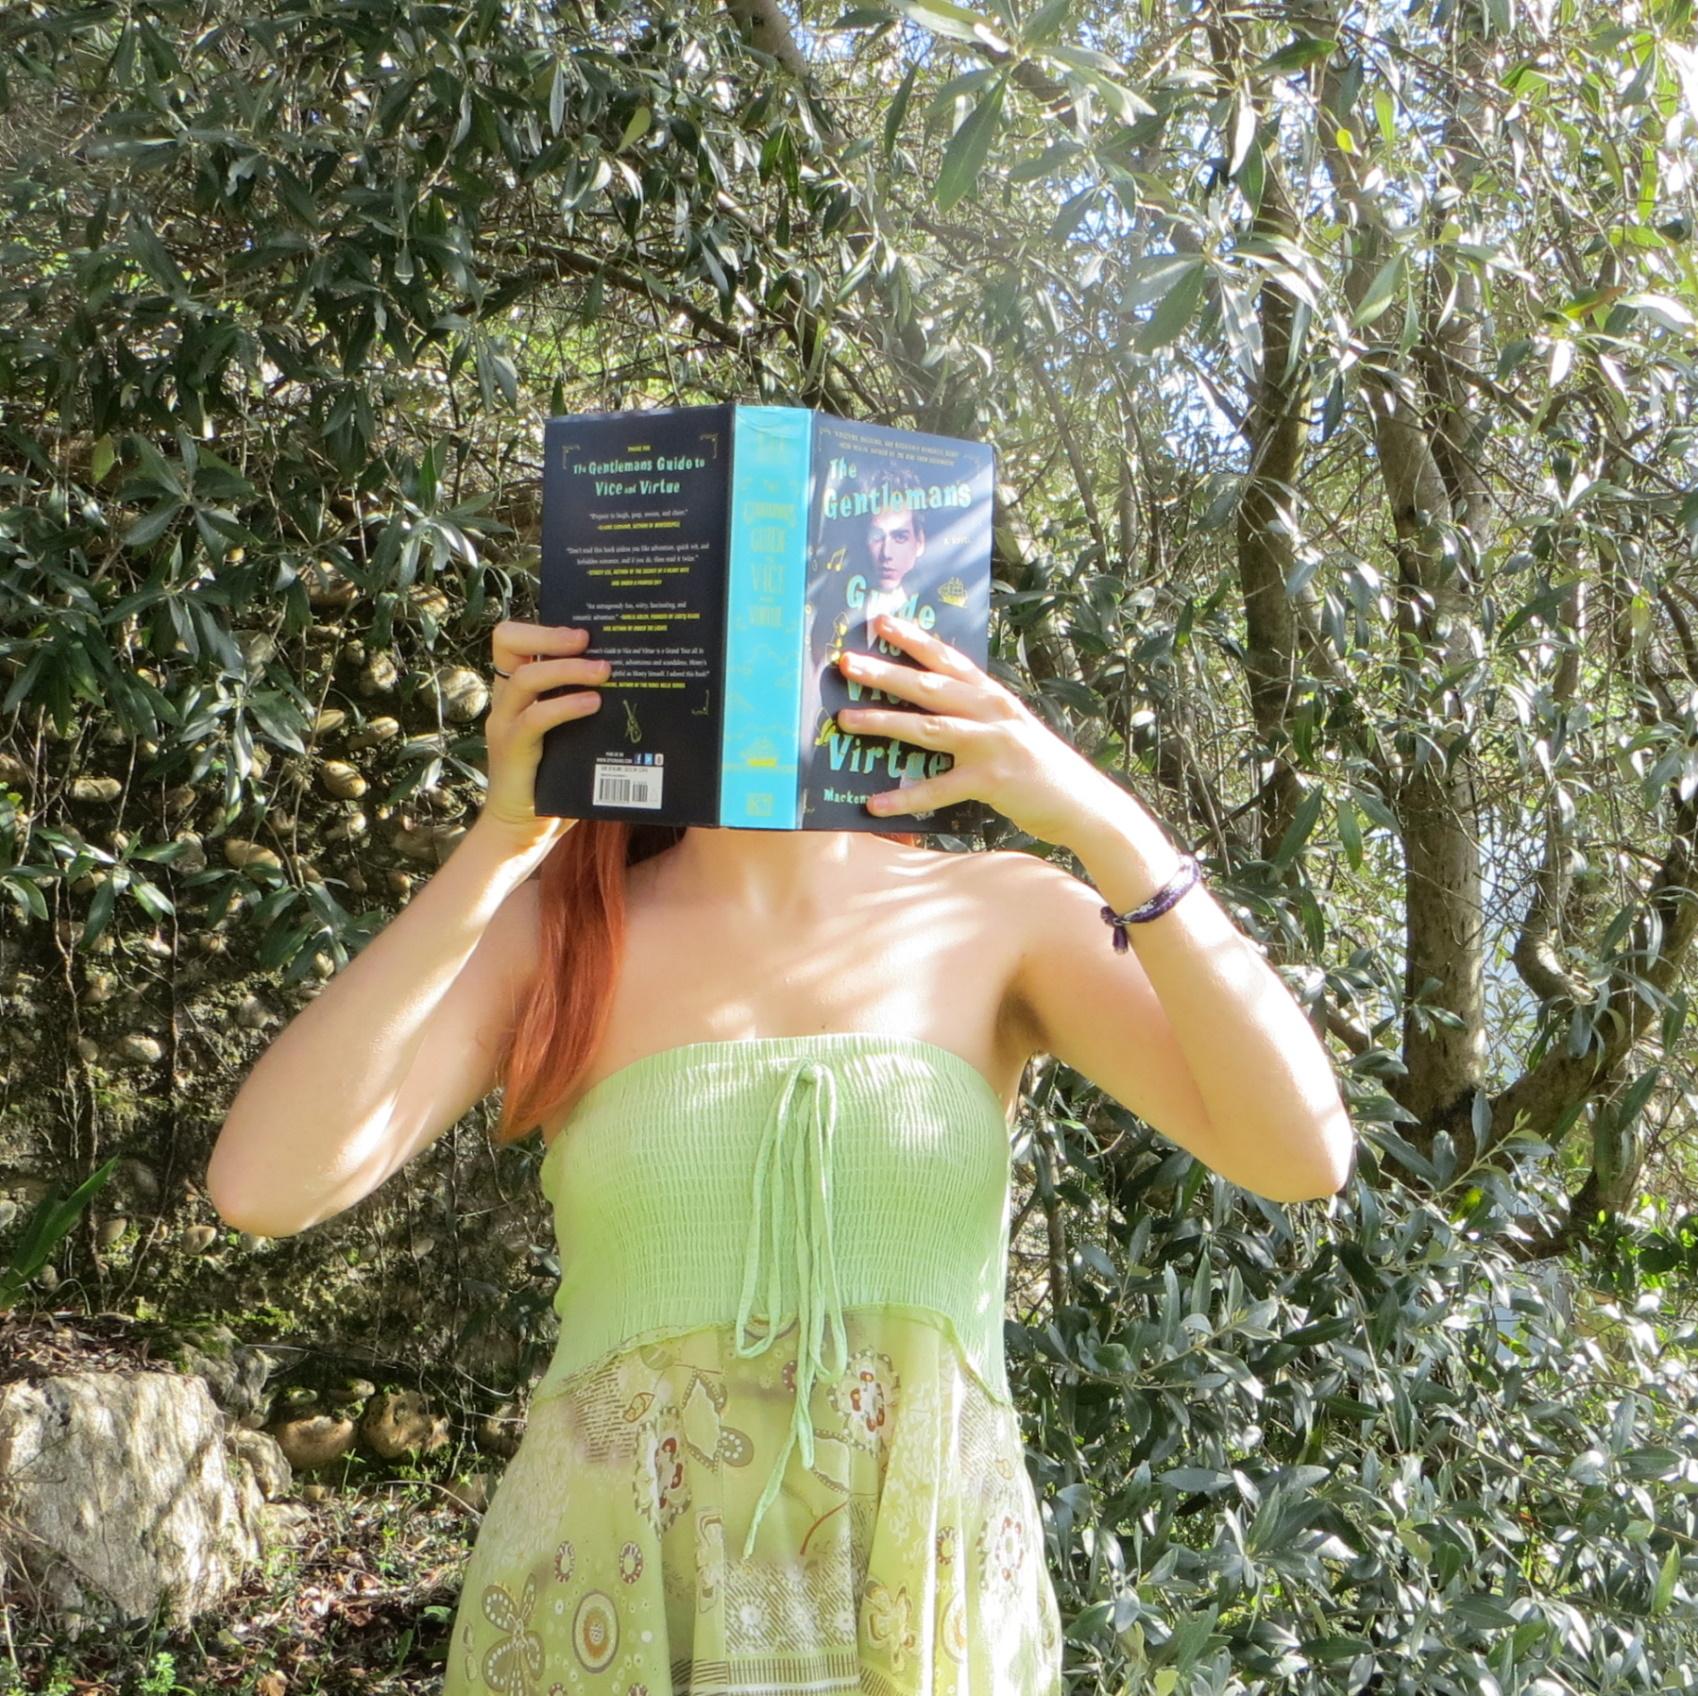 personne en robe verte lisant The Gentleman's Guide devant un olivier